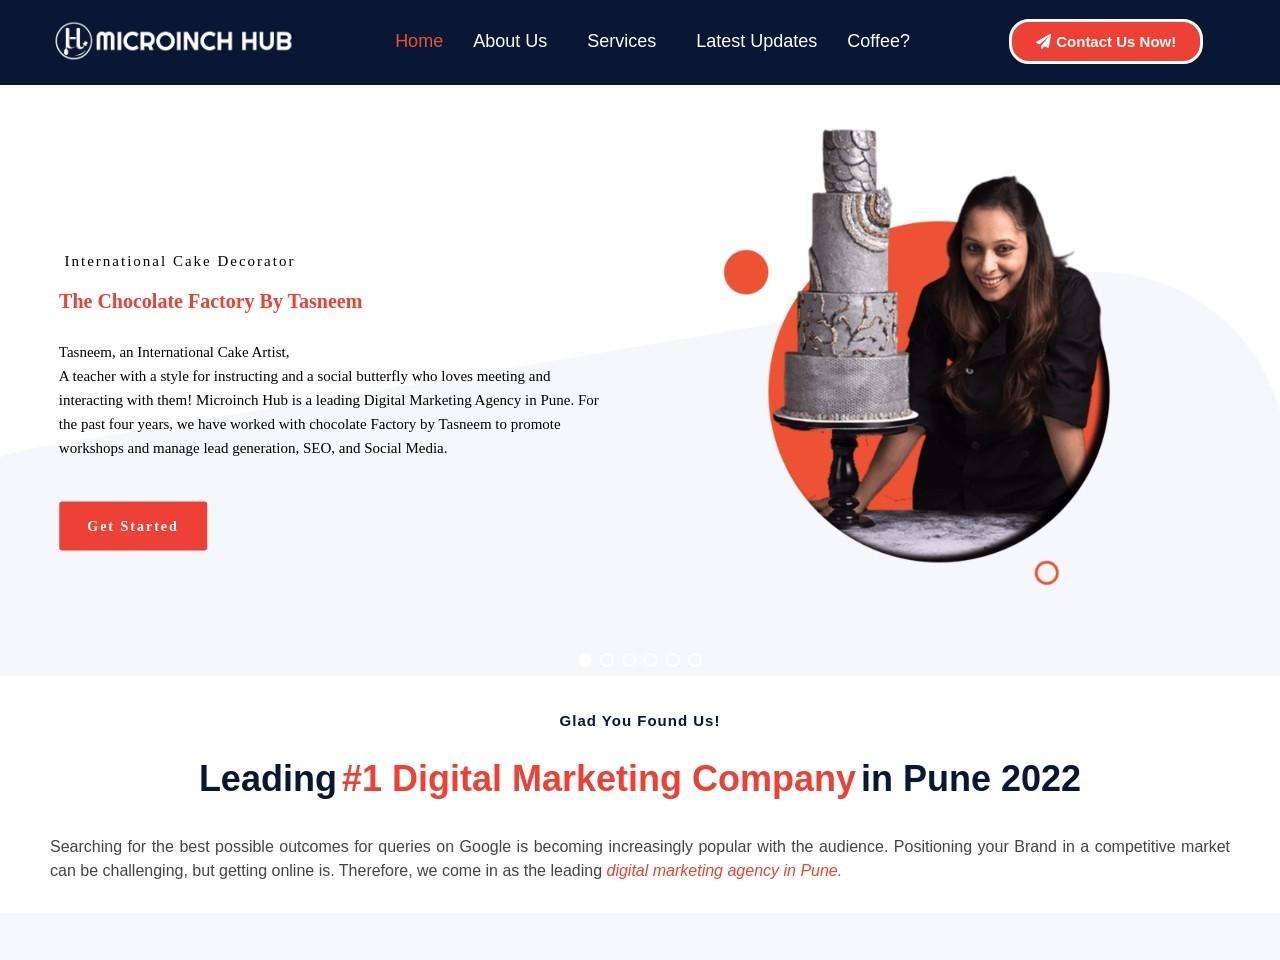 100% ROI Driven Digital Marketing Agency in Pune | SEO | SMM | PPC